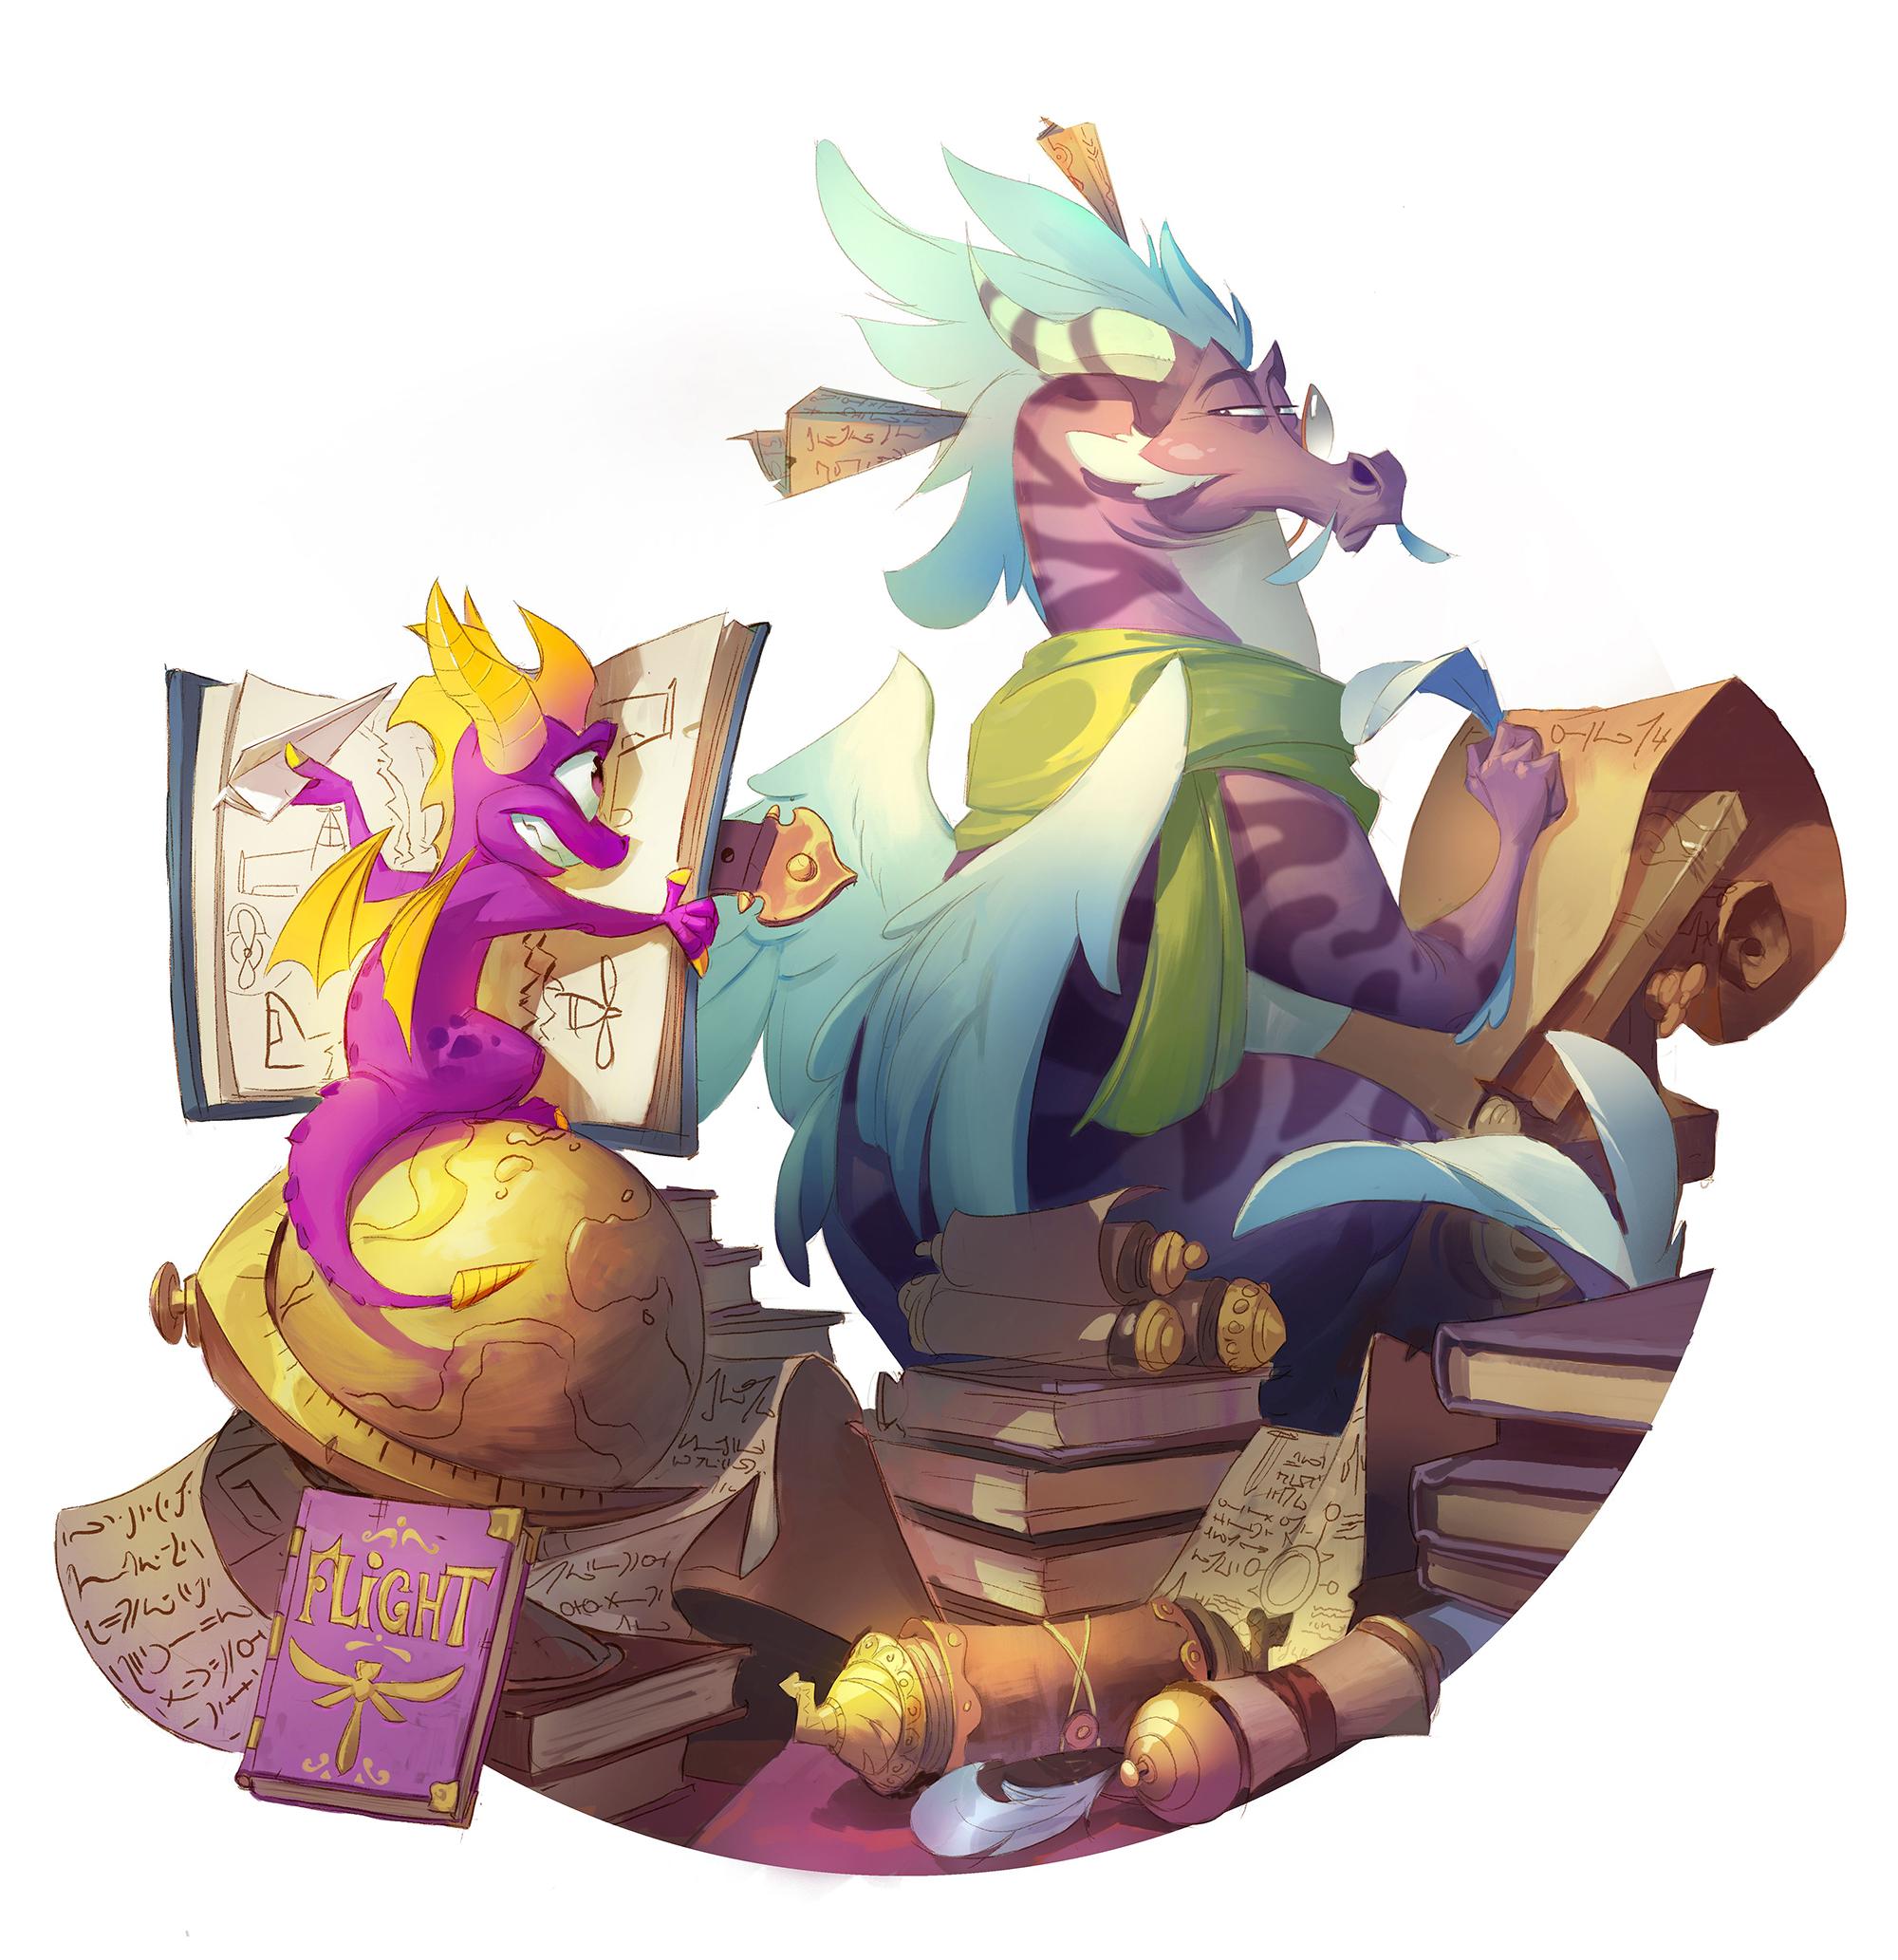 Spyro Reignited Trilogy Concept Art 1